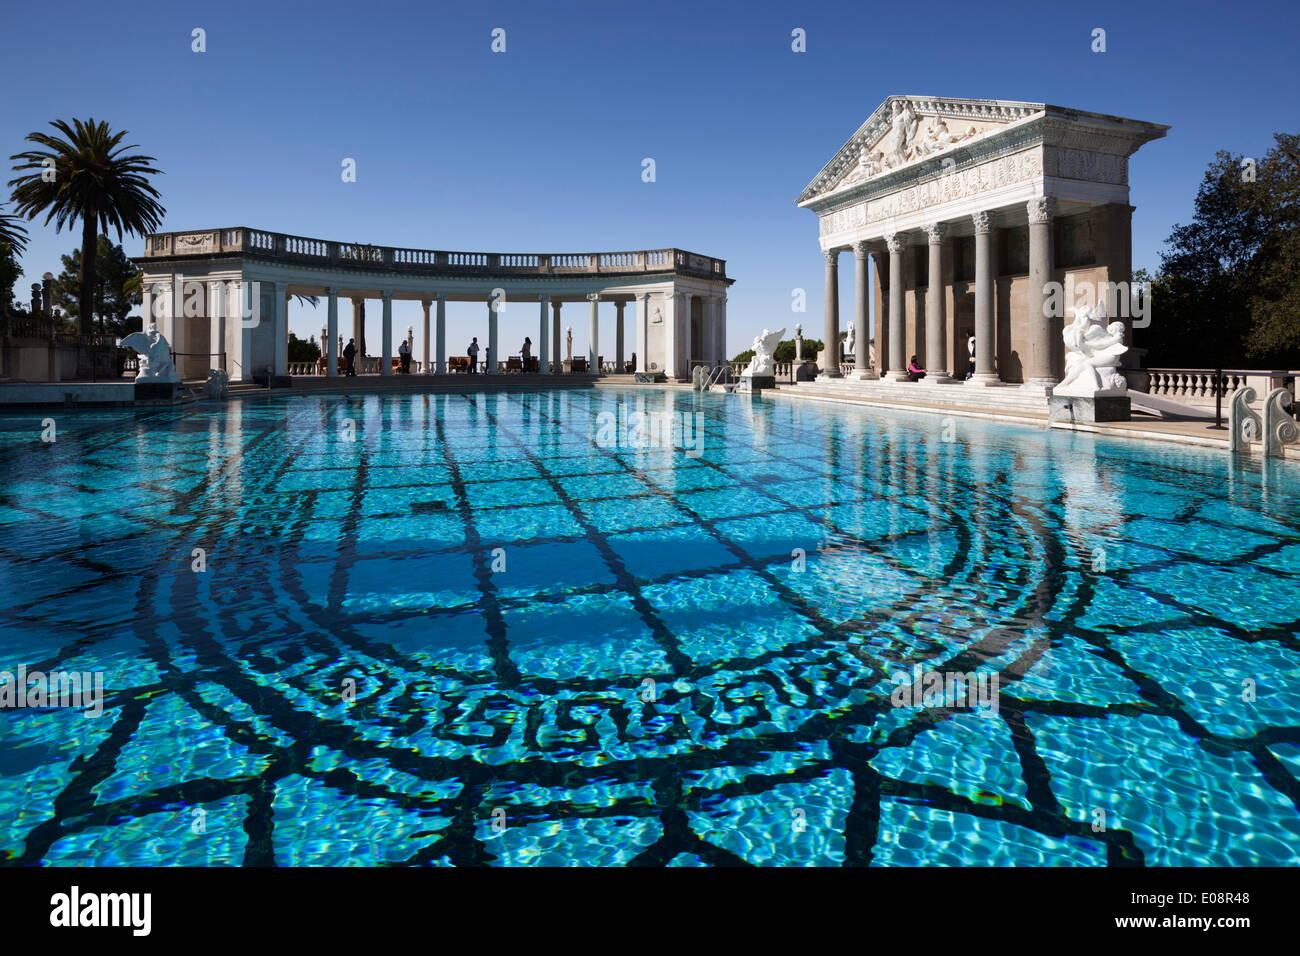 Neptune pool hearst castle san simeon san luis obispo - Hearst castle neptune pool swim auction ...